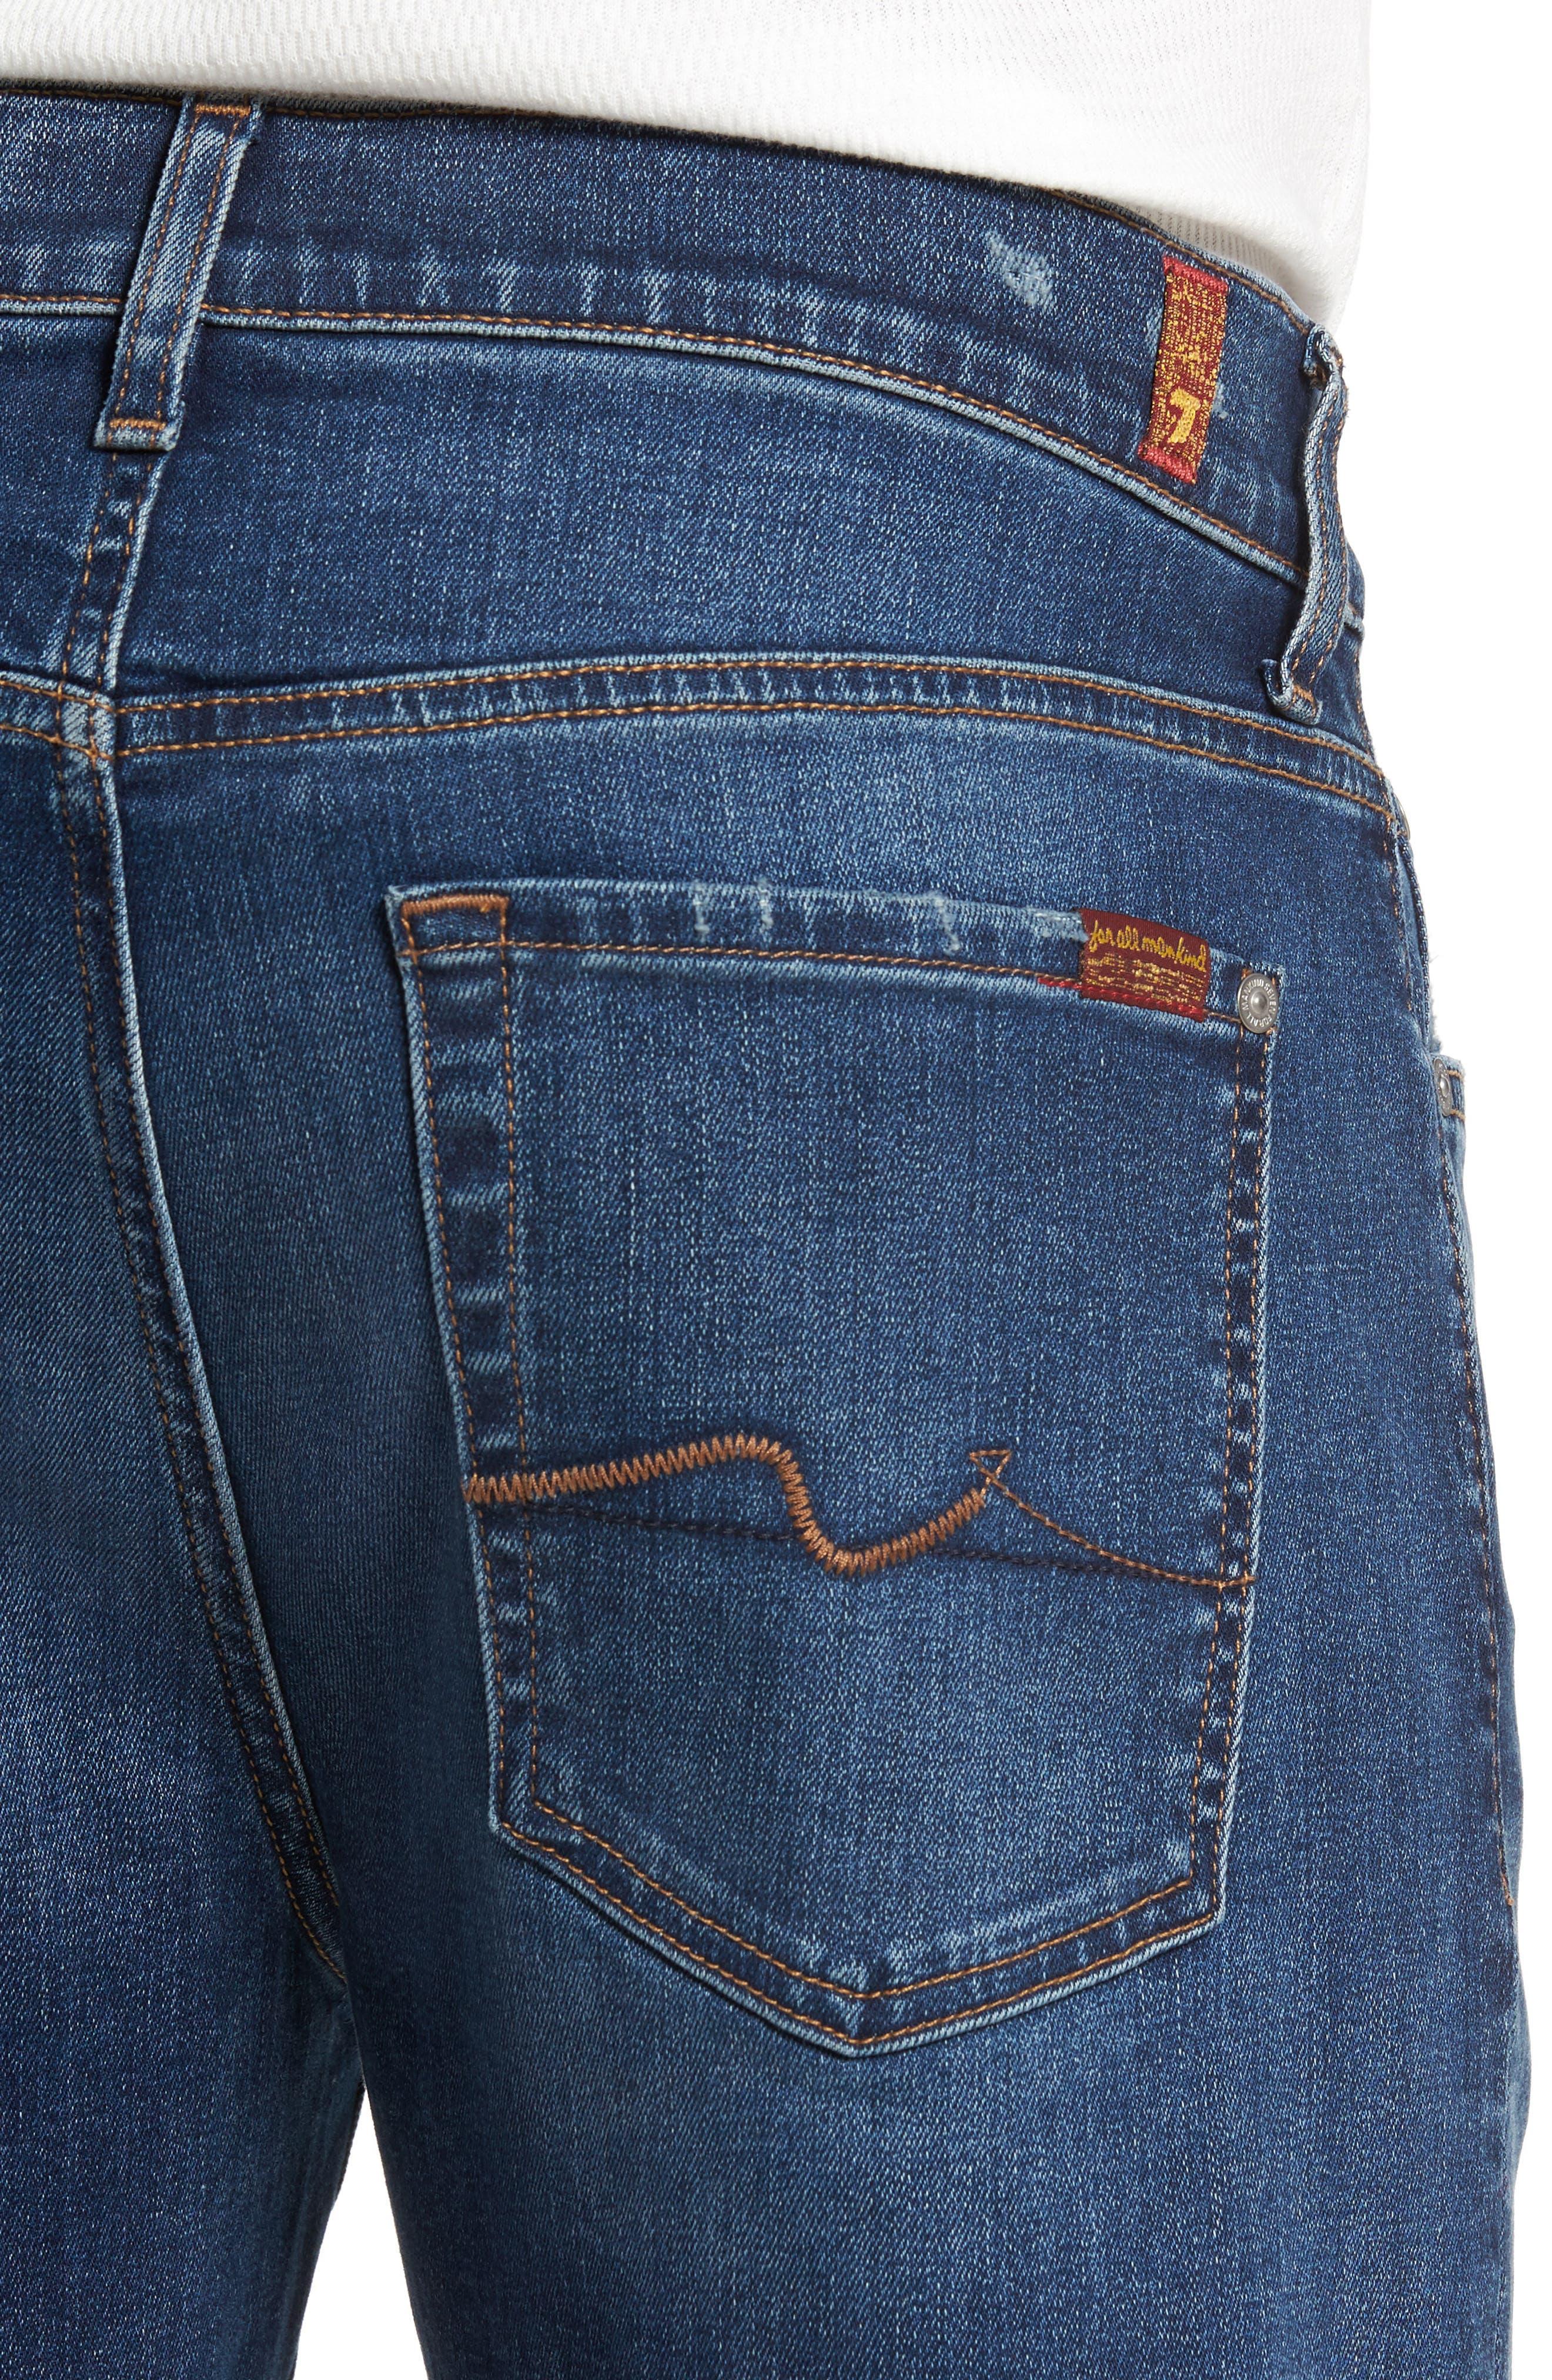 Slimmy Slim Fit Jeans,                             Alternate thumbnail 4, color,                             407